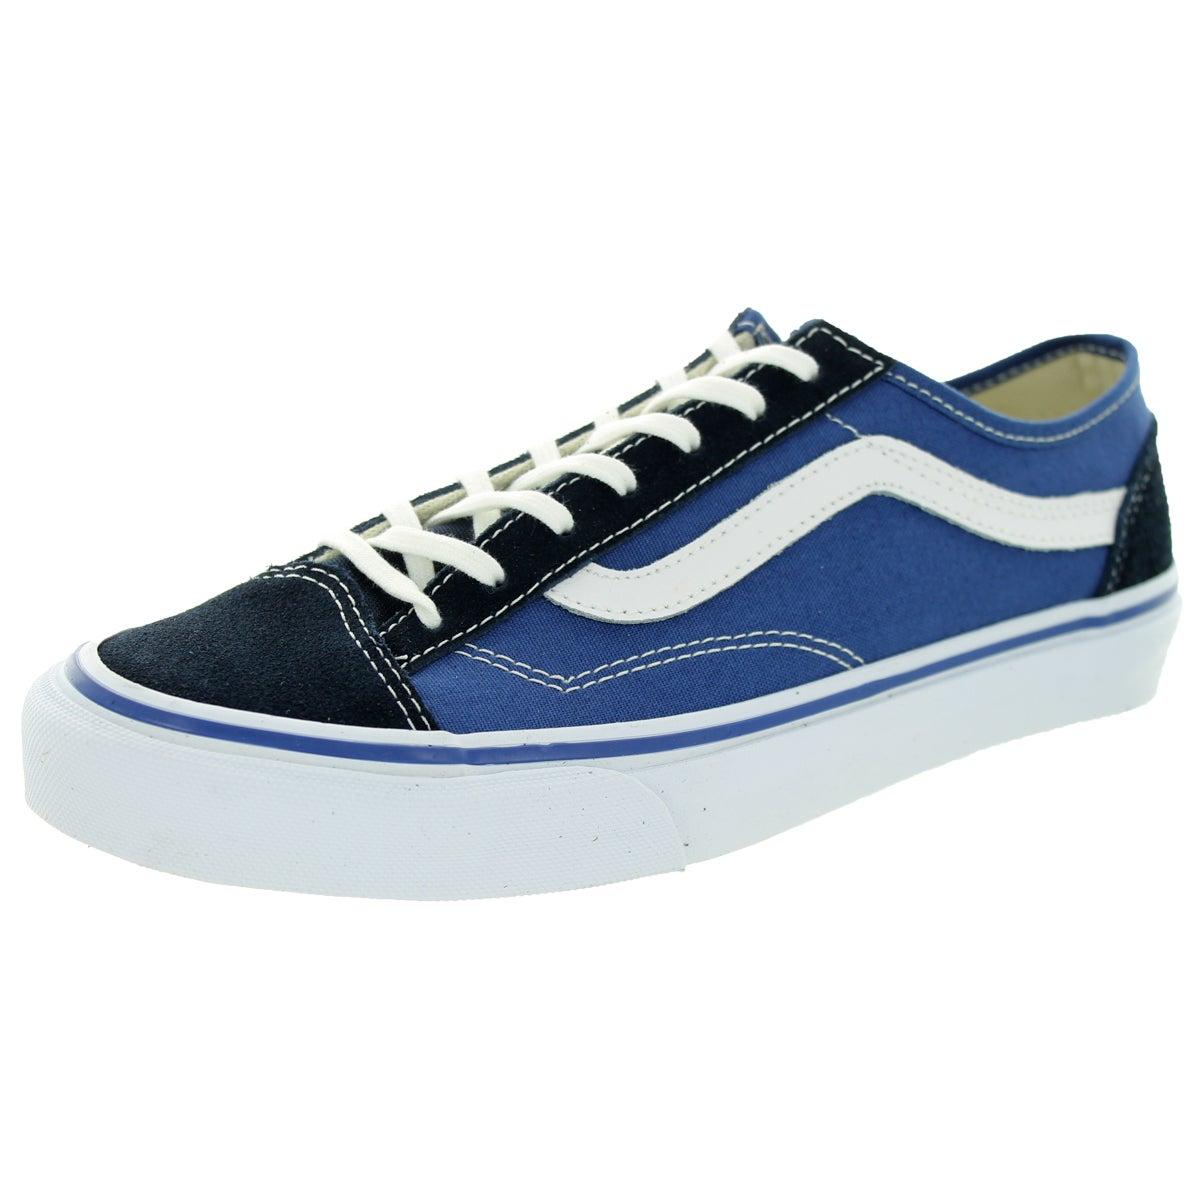 4058ba1a408b Shop Vans Unisex Style 36 Slim Navy Black White Skate Shoes - Free ...